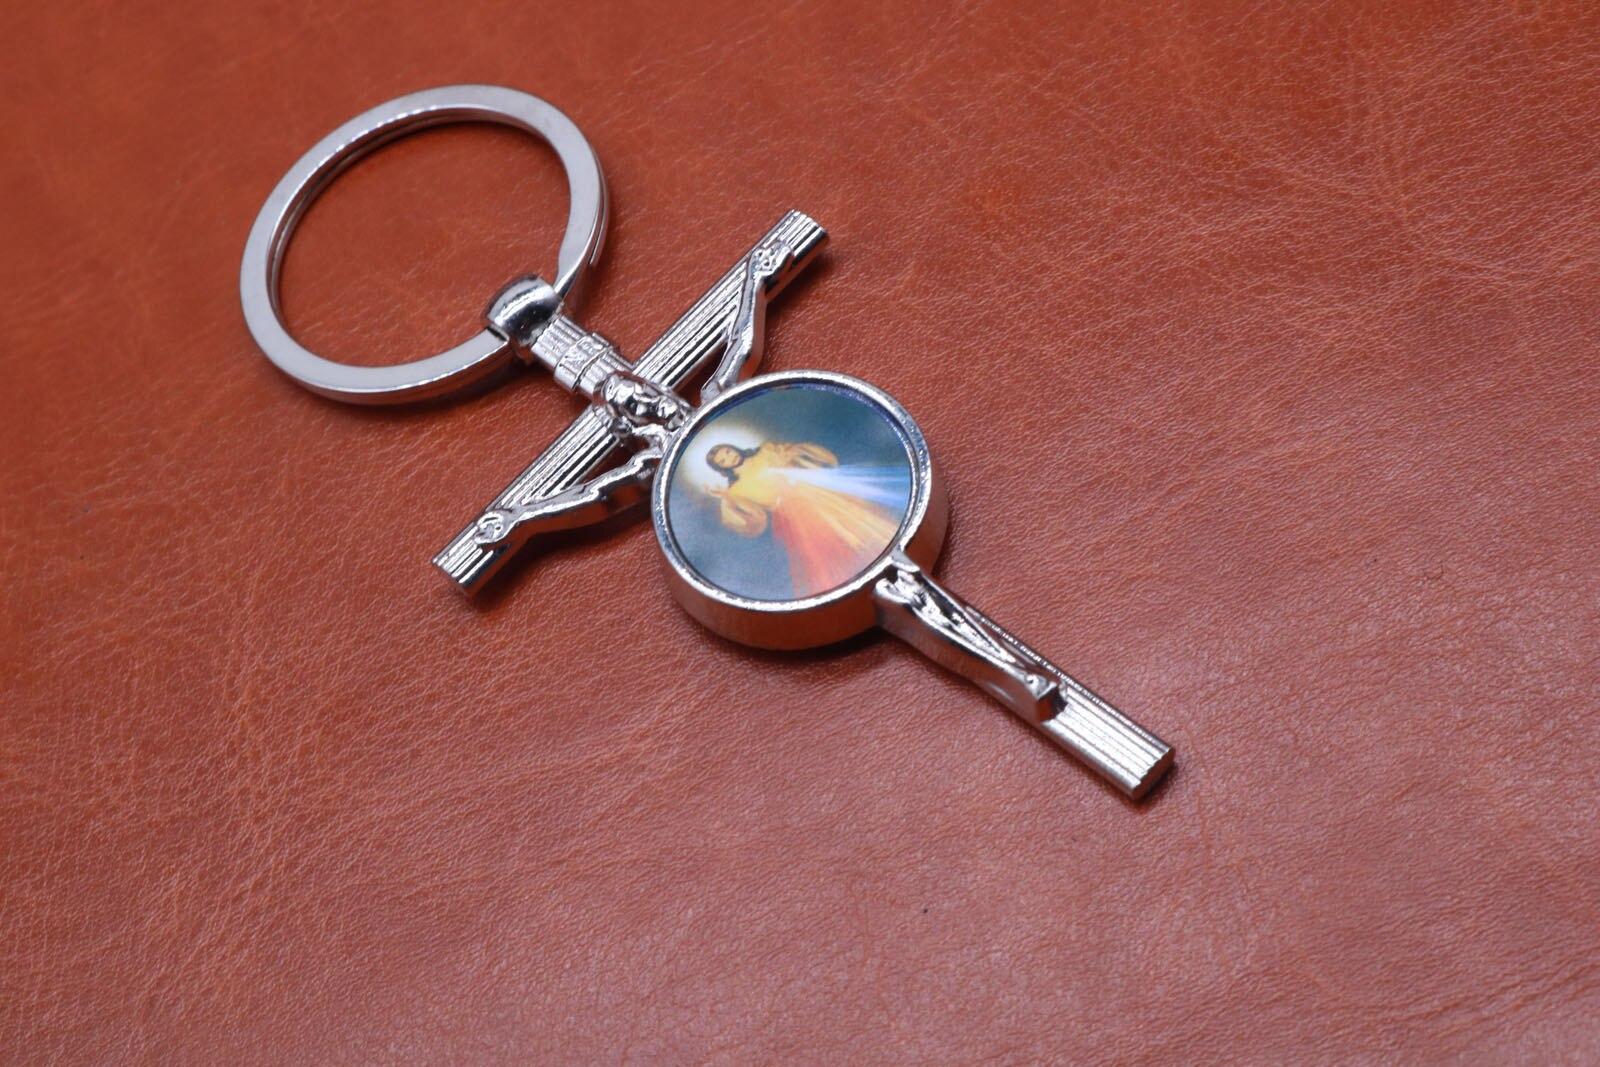 Classic Silver Charm Jesus Christian key ring key car key ring, handbag, gift accessories free shipping